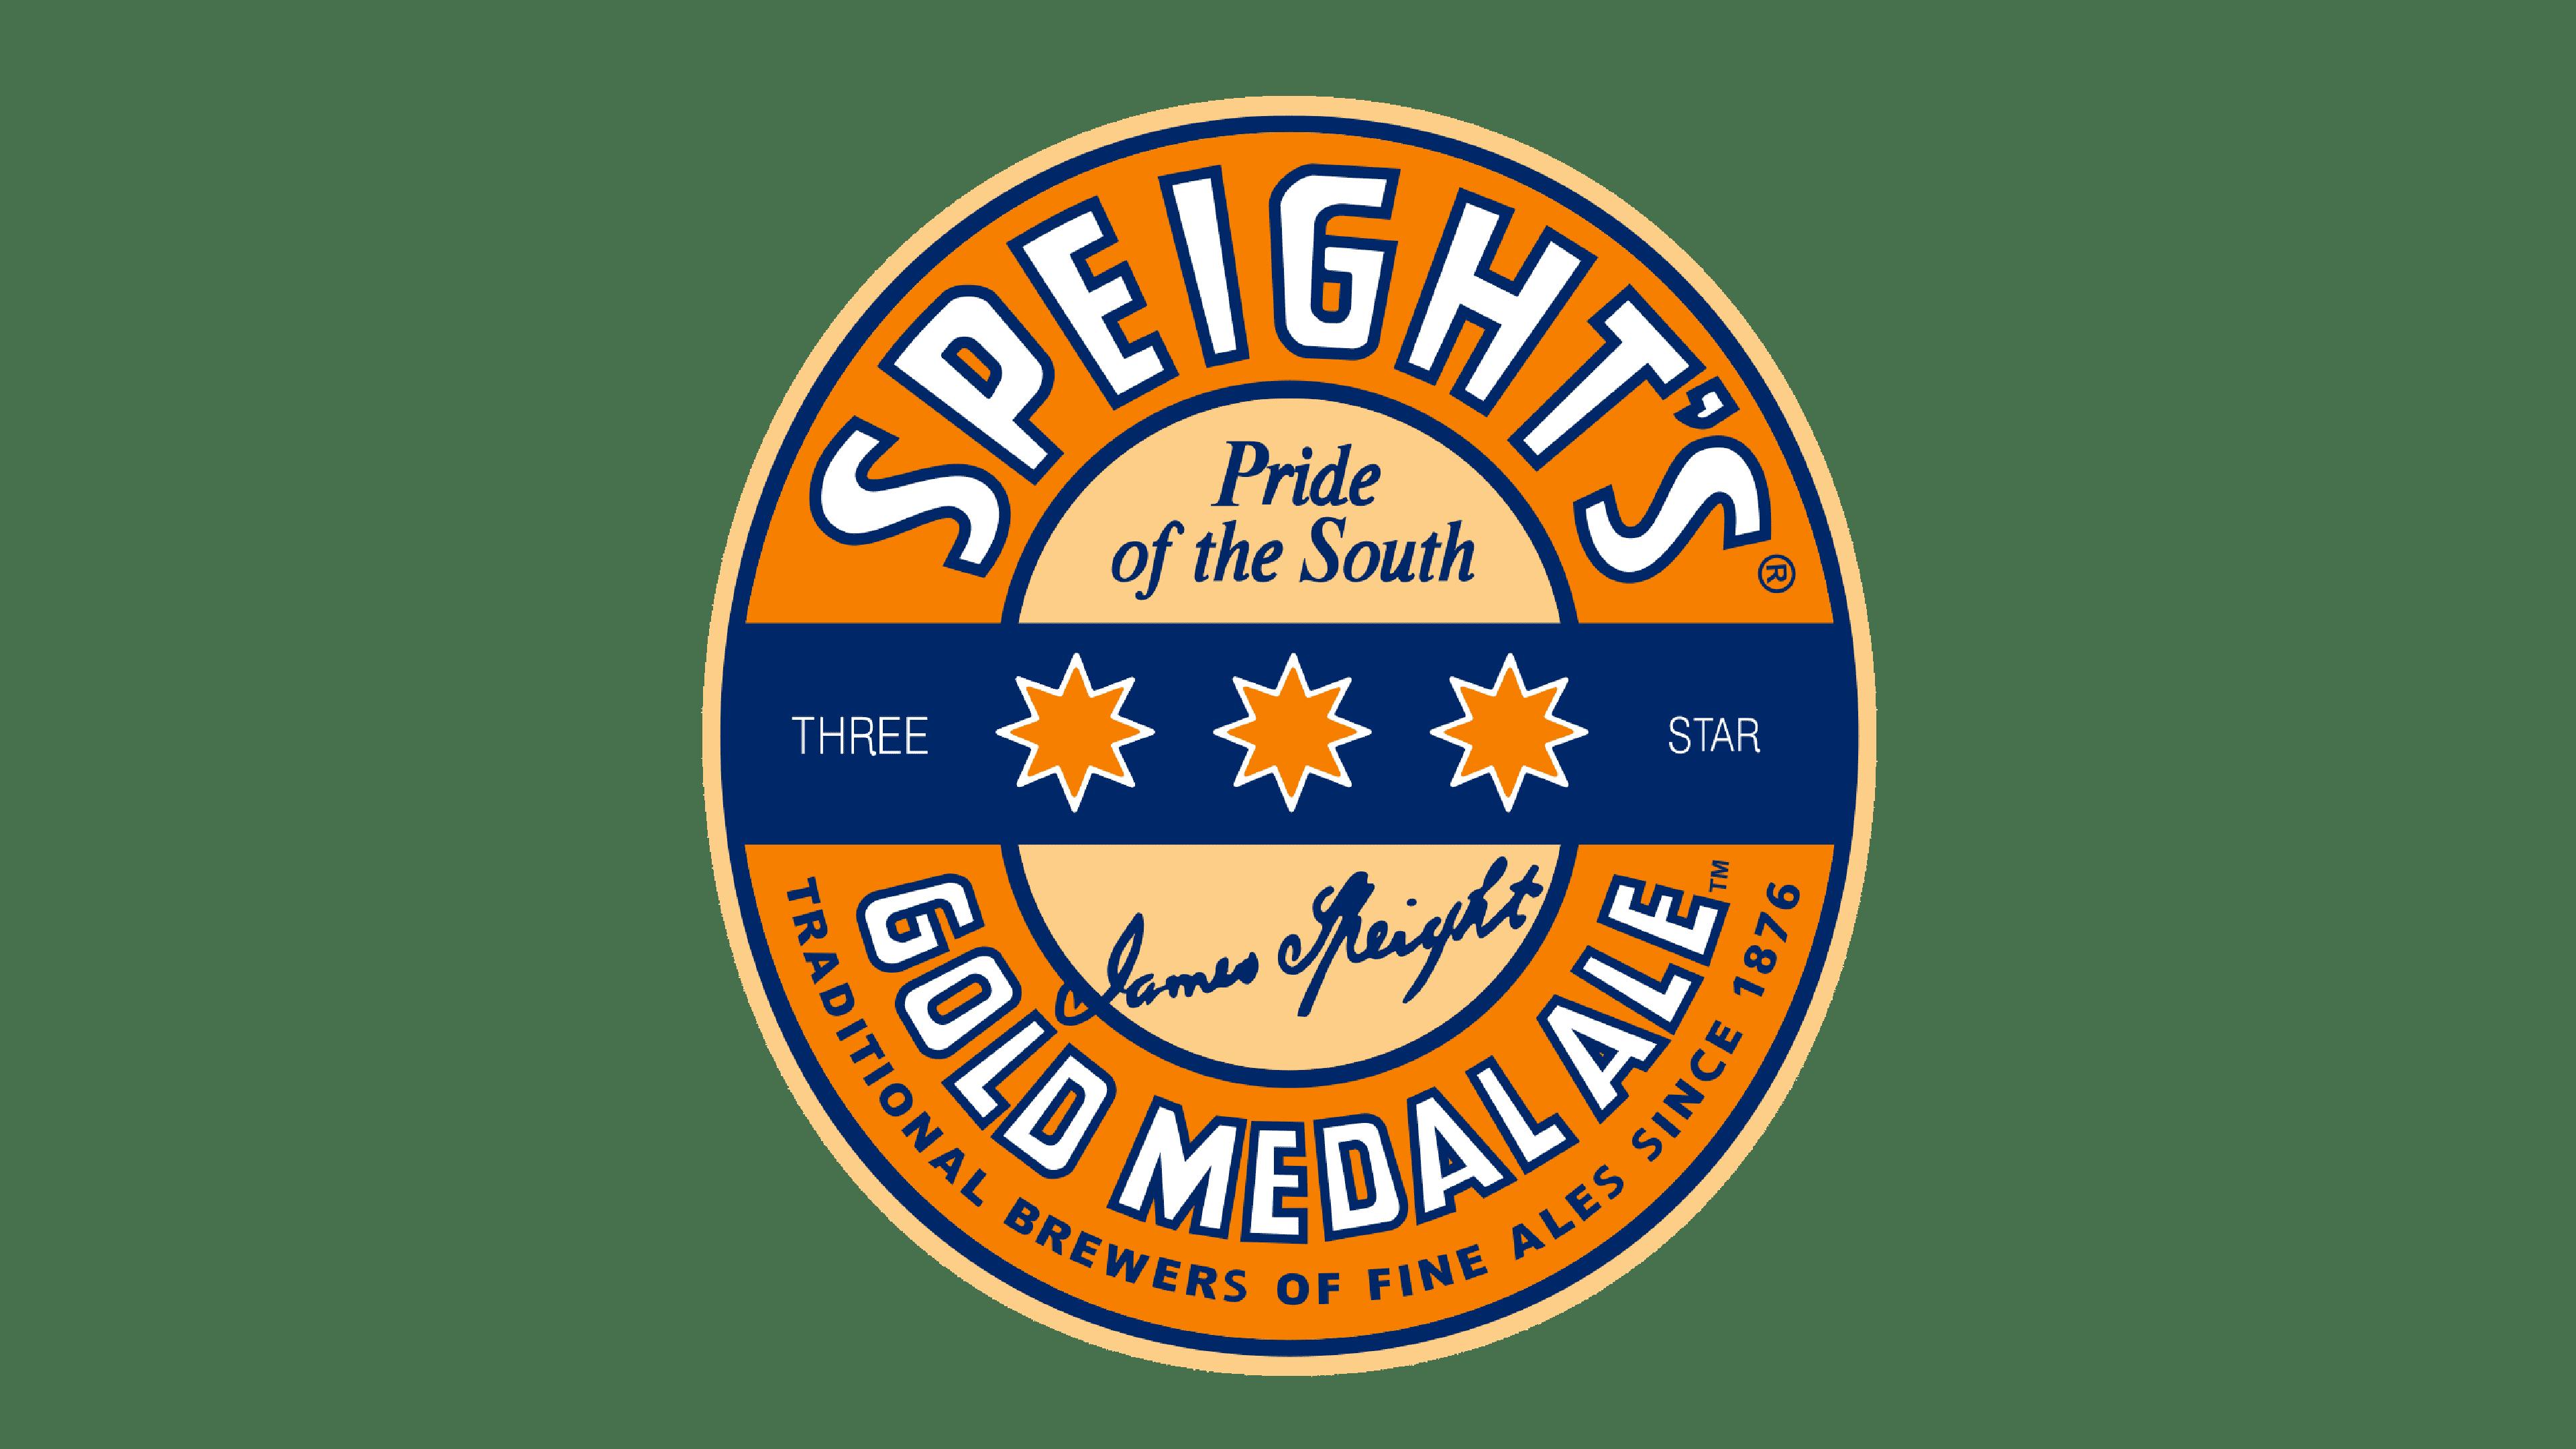 Speight's Logo Logo